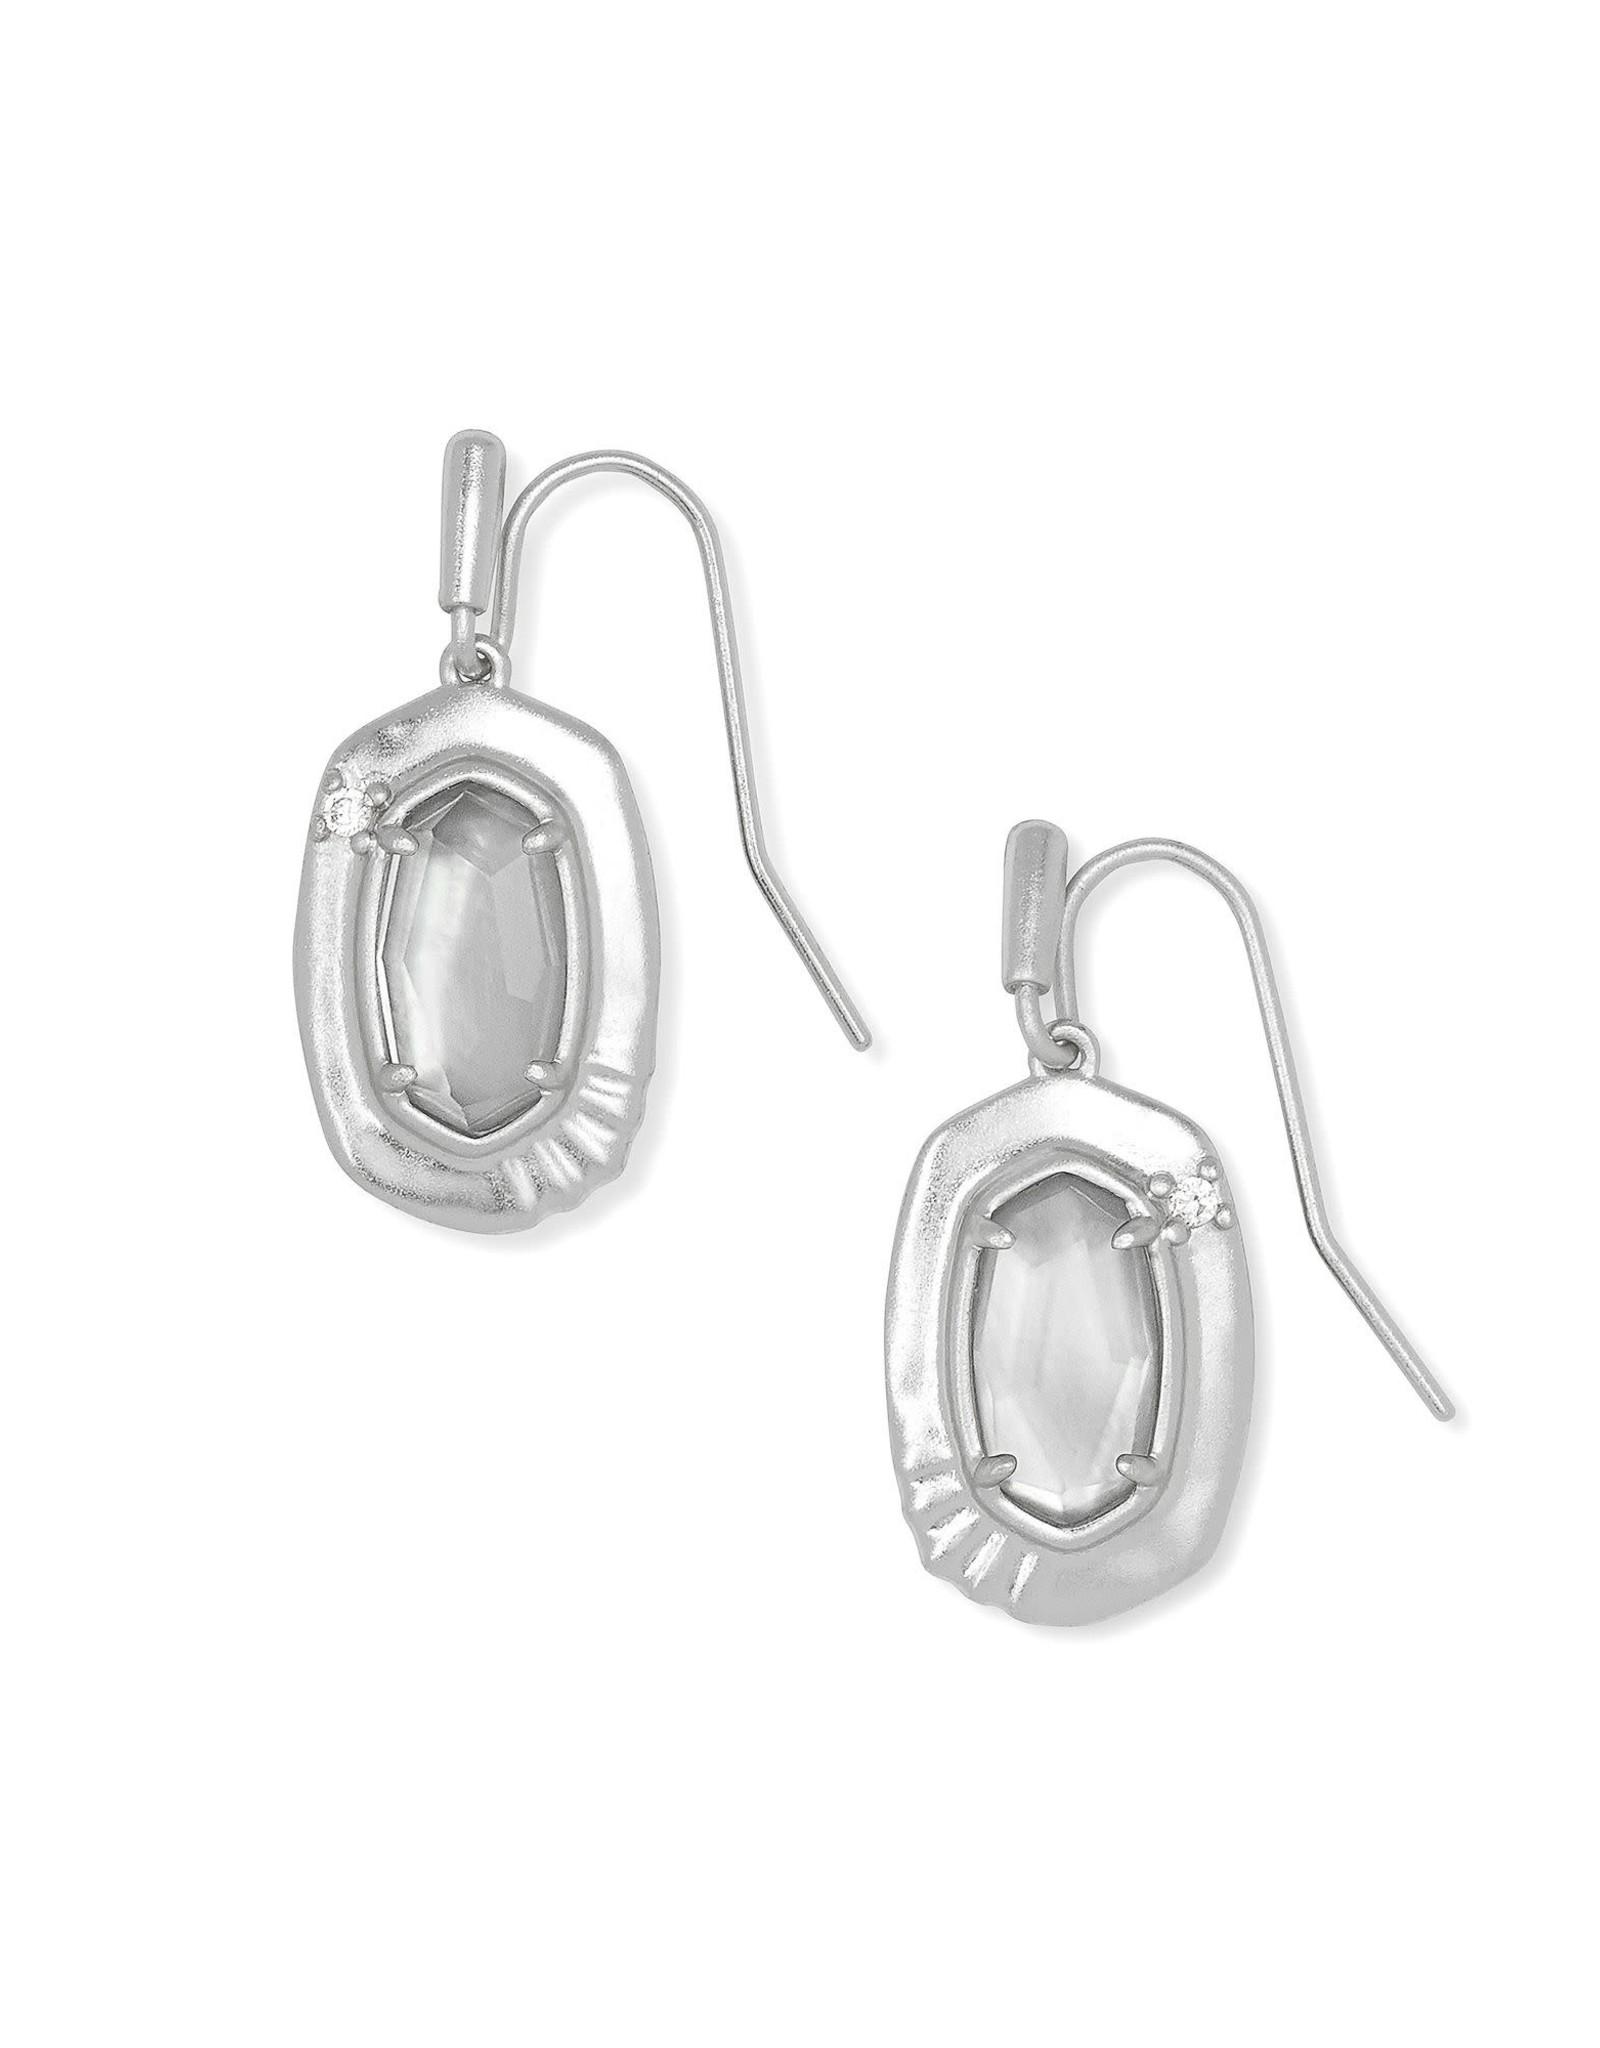 Kendra Scott Anna Small Drop Earring - Gray Illusion/Rhodium